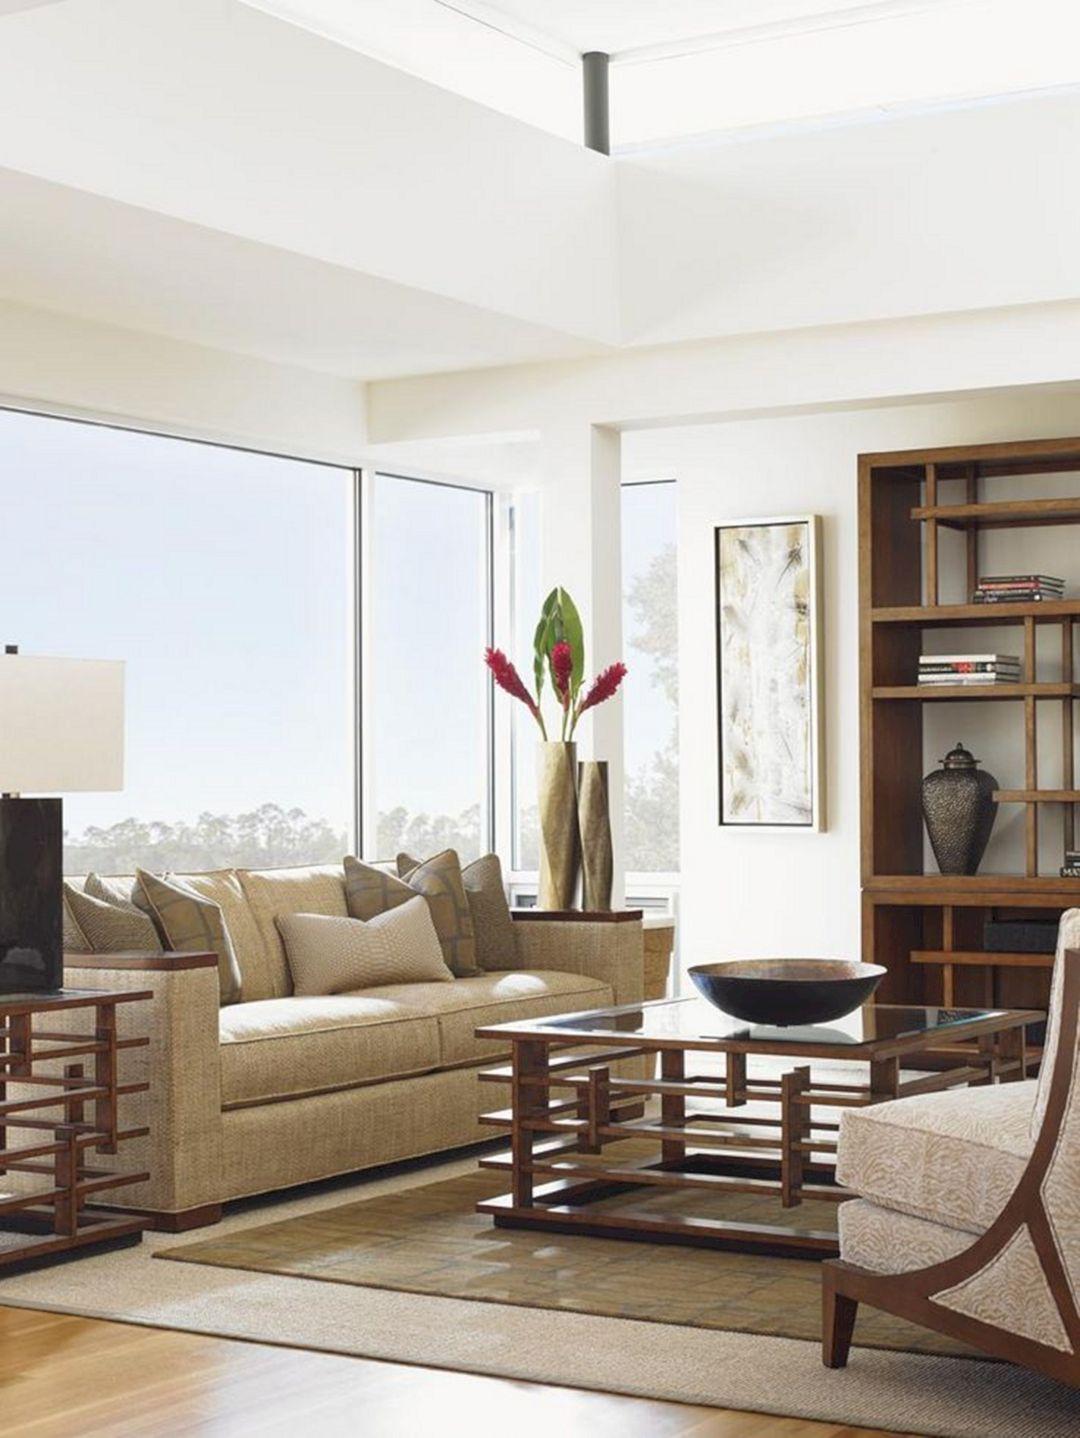 Brilliant 5 incredible modern casual living room design ideas https decoredo